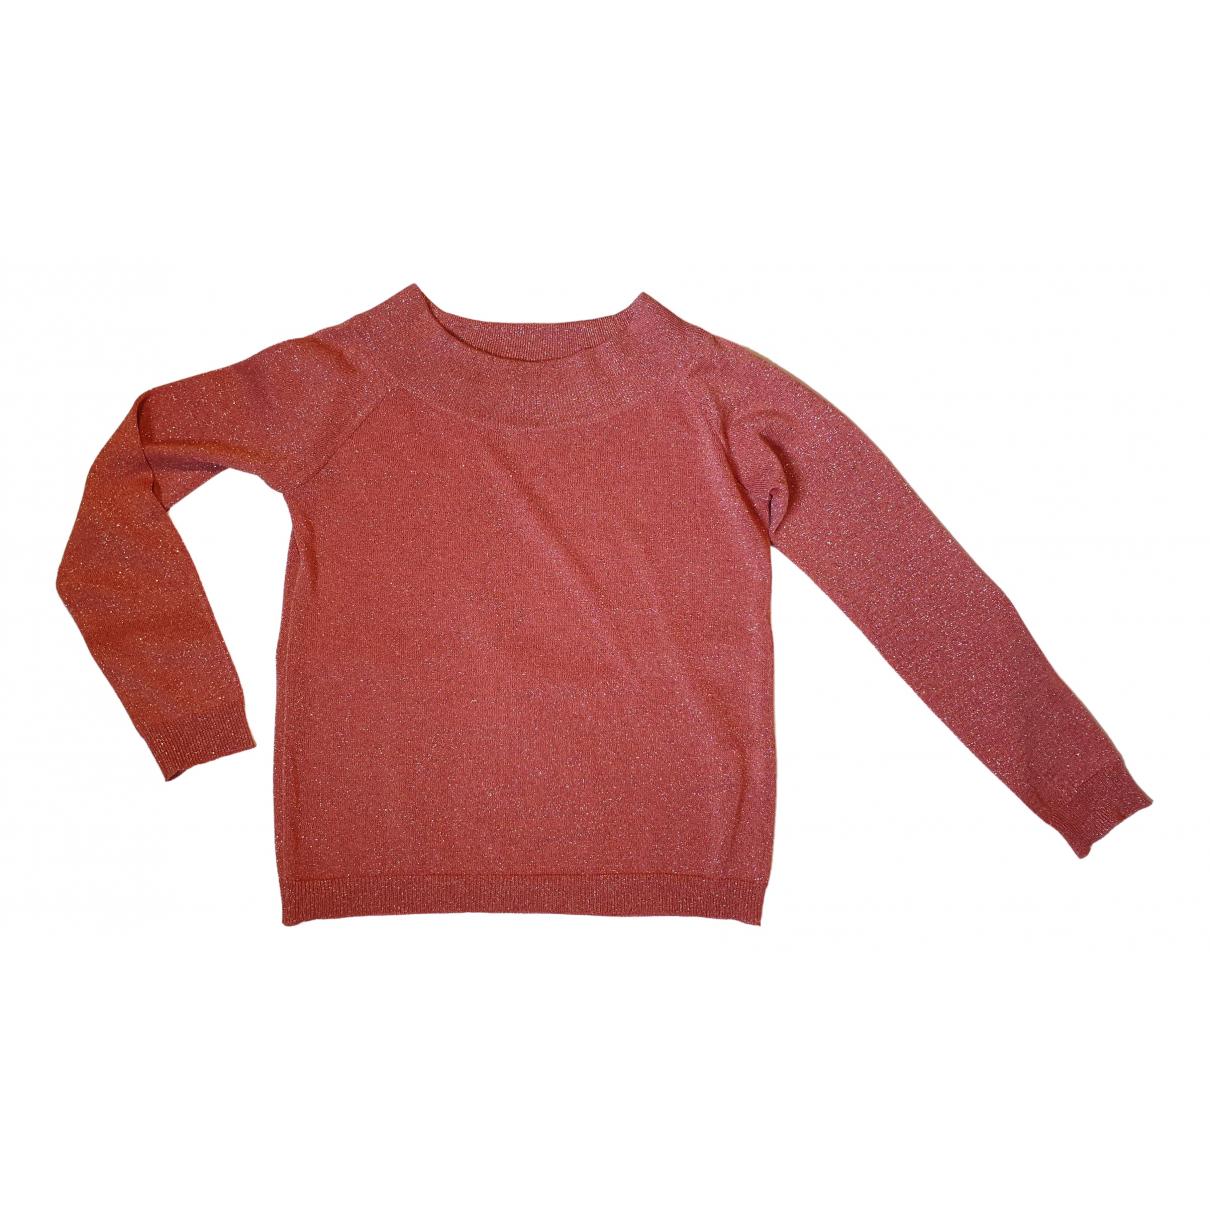 Vicolo N Pink Knitwear for Women One Size IT